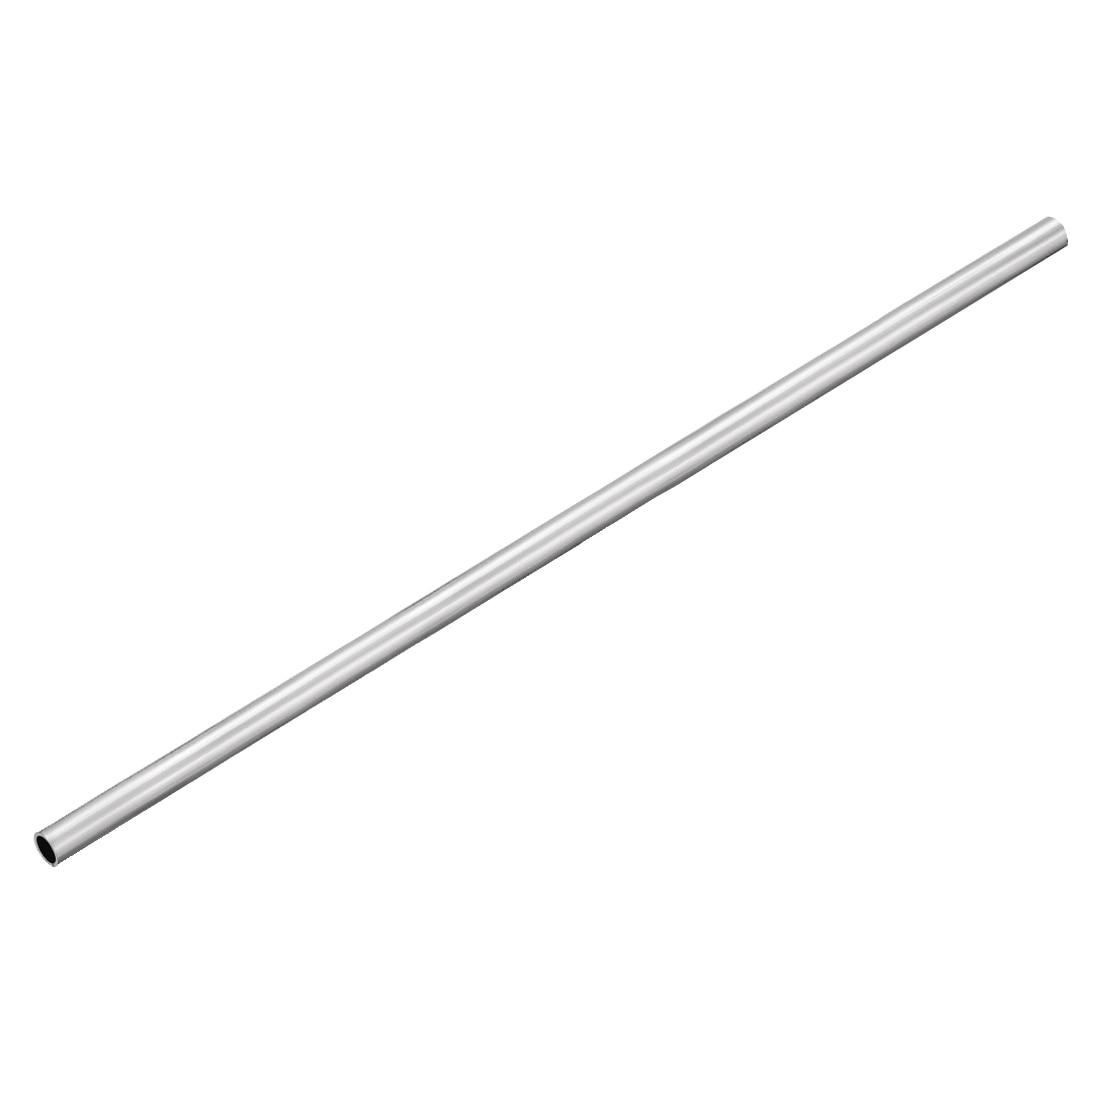 uxcell 6063 Aluminum Round Tube 300mm Length 18mm OD 15mm Inner Dia Seamless Aluminum Straight Tubing 3 Pcs